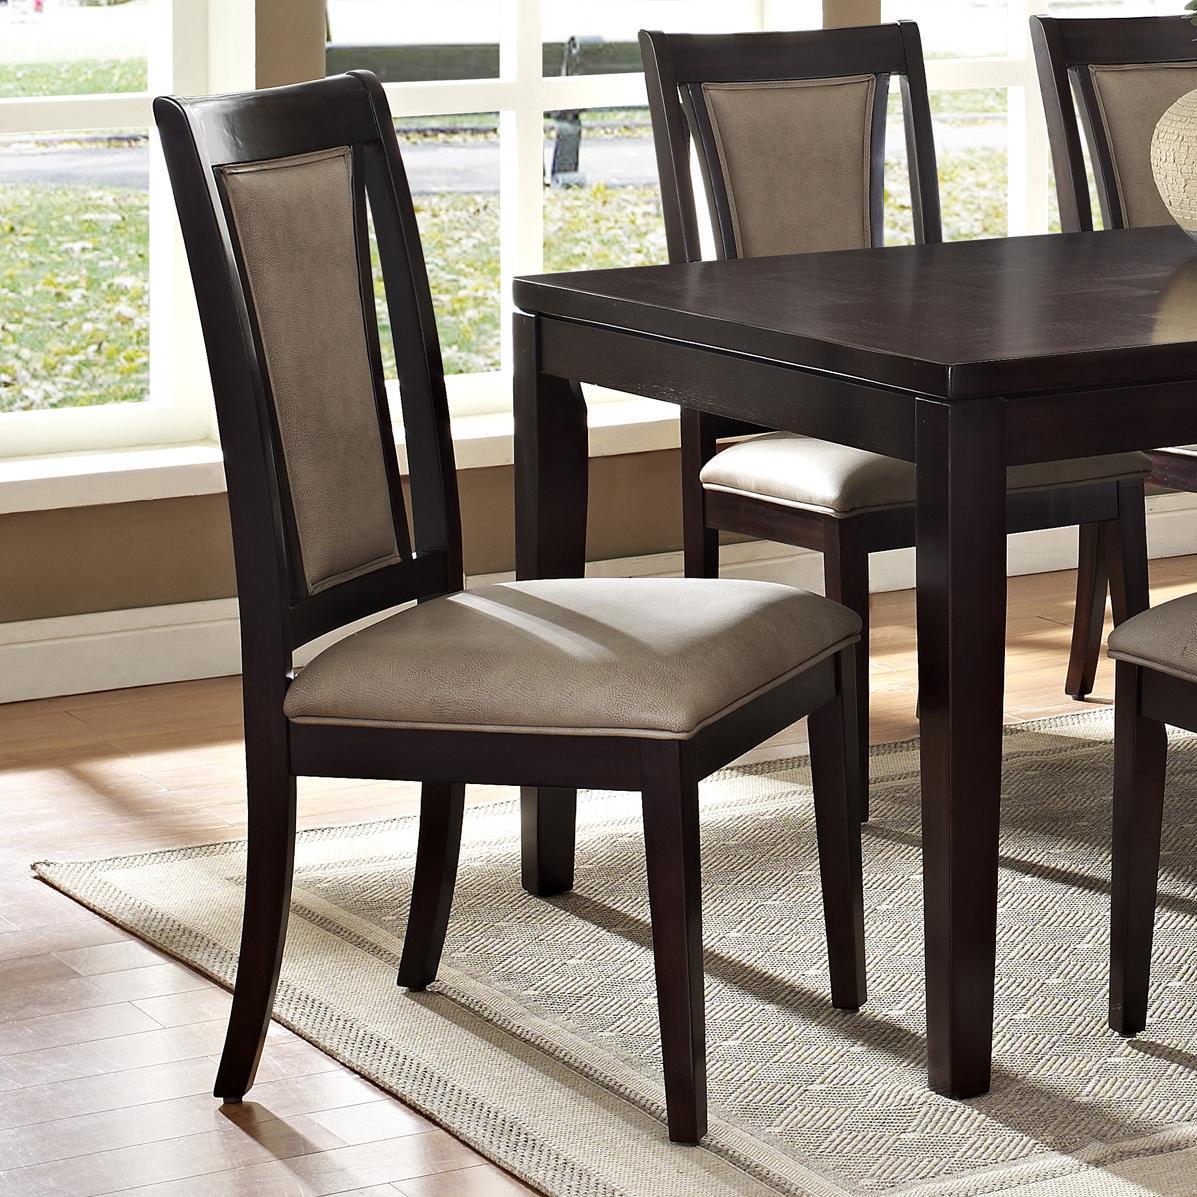 Steve Silver Wilson Side Chair - Item Number: WL500S